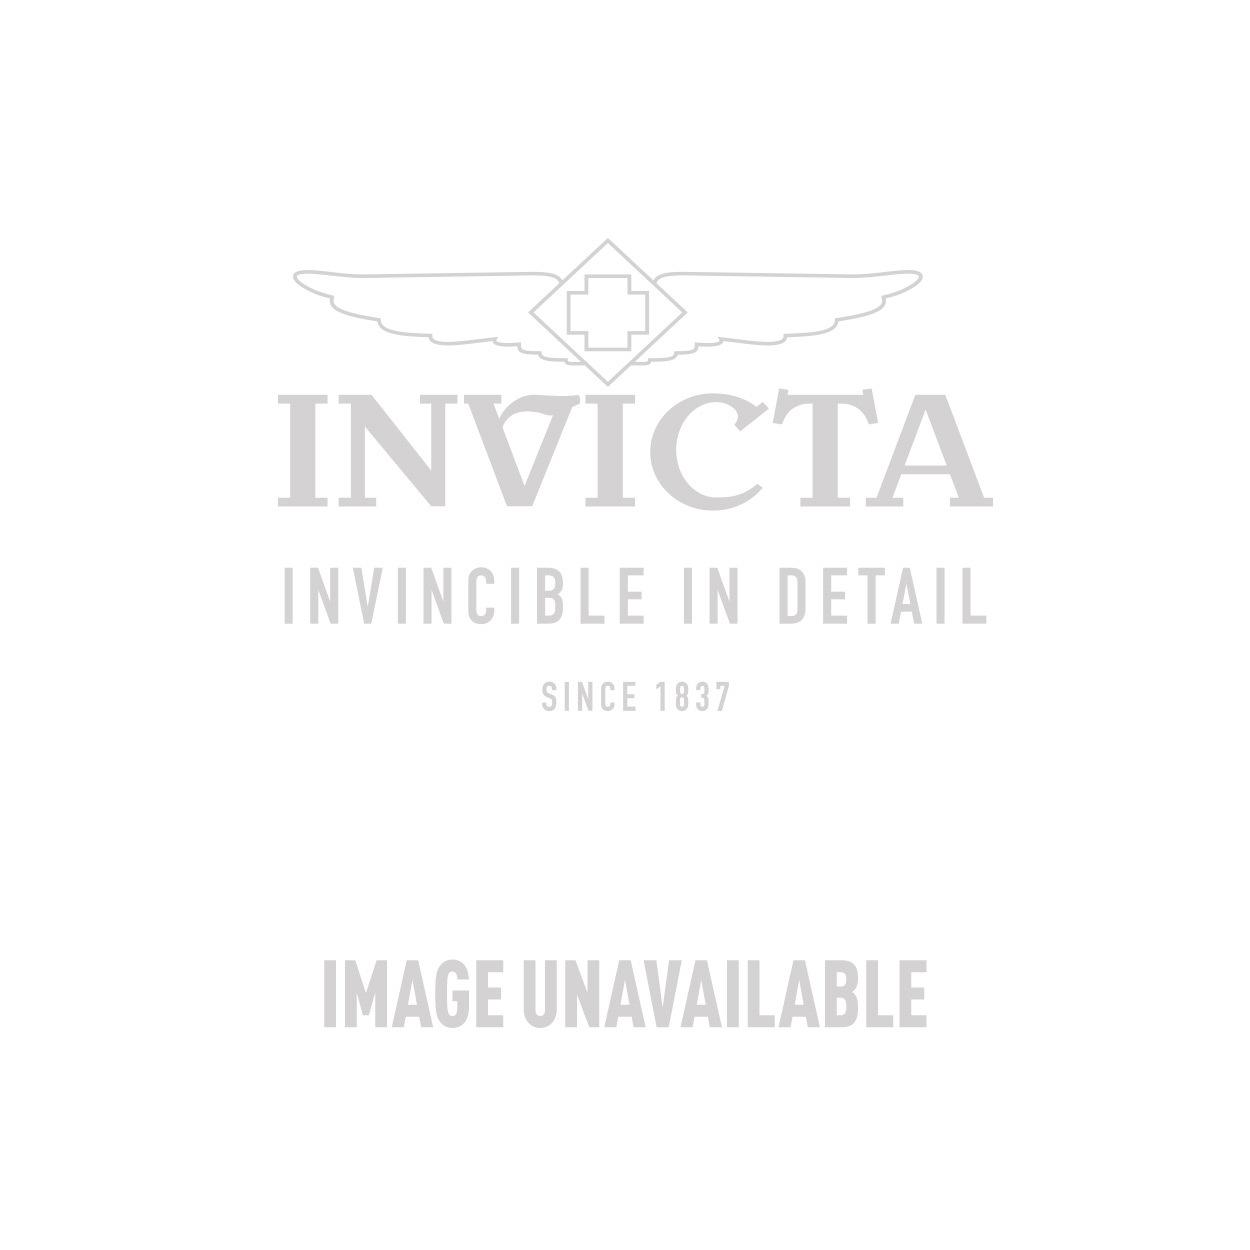 Invicta Pro Diver Quartz Watch - Gold, Black case with Gold, Black tone  Stainless